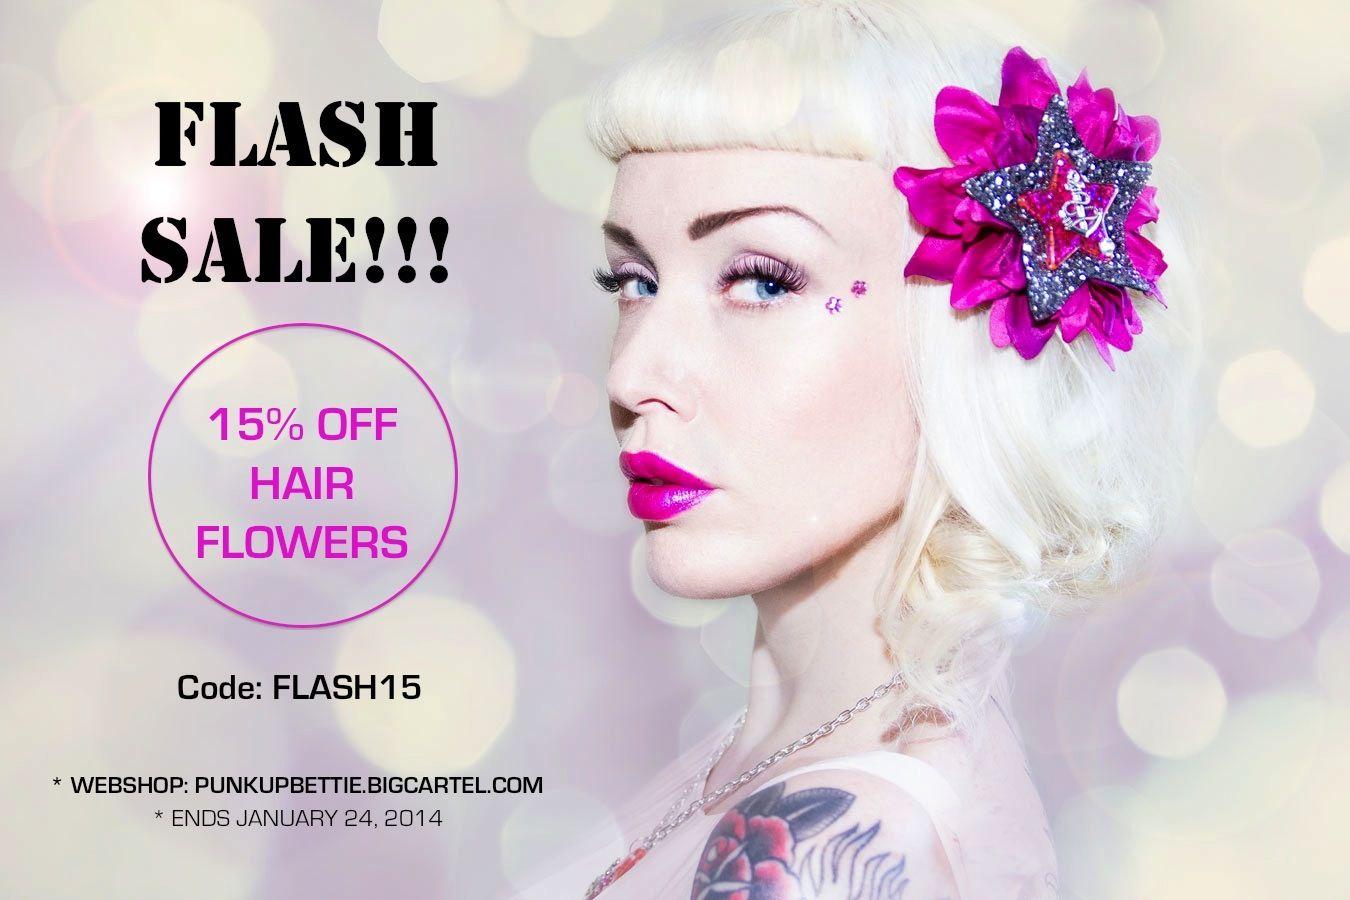 LAST MINUTE FLASH SALE! 15% OFF HAIR FLOWERS! Code: FLASH15 (Expires January 24, 2014) http://punkupbettie.bigcartel.com/category/hair-flowers